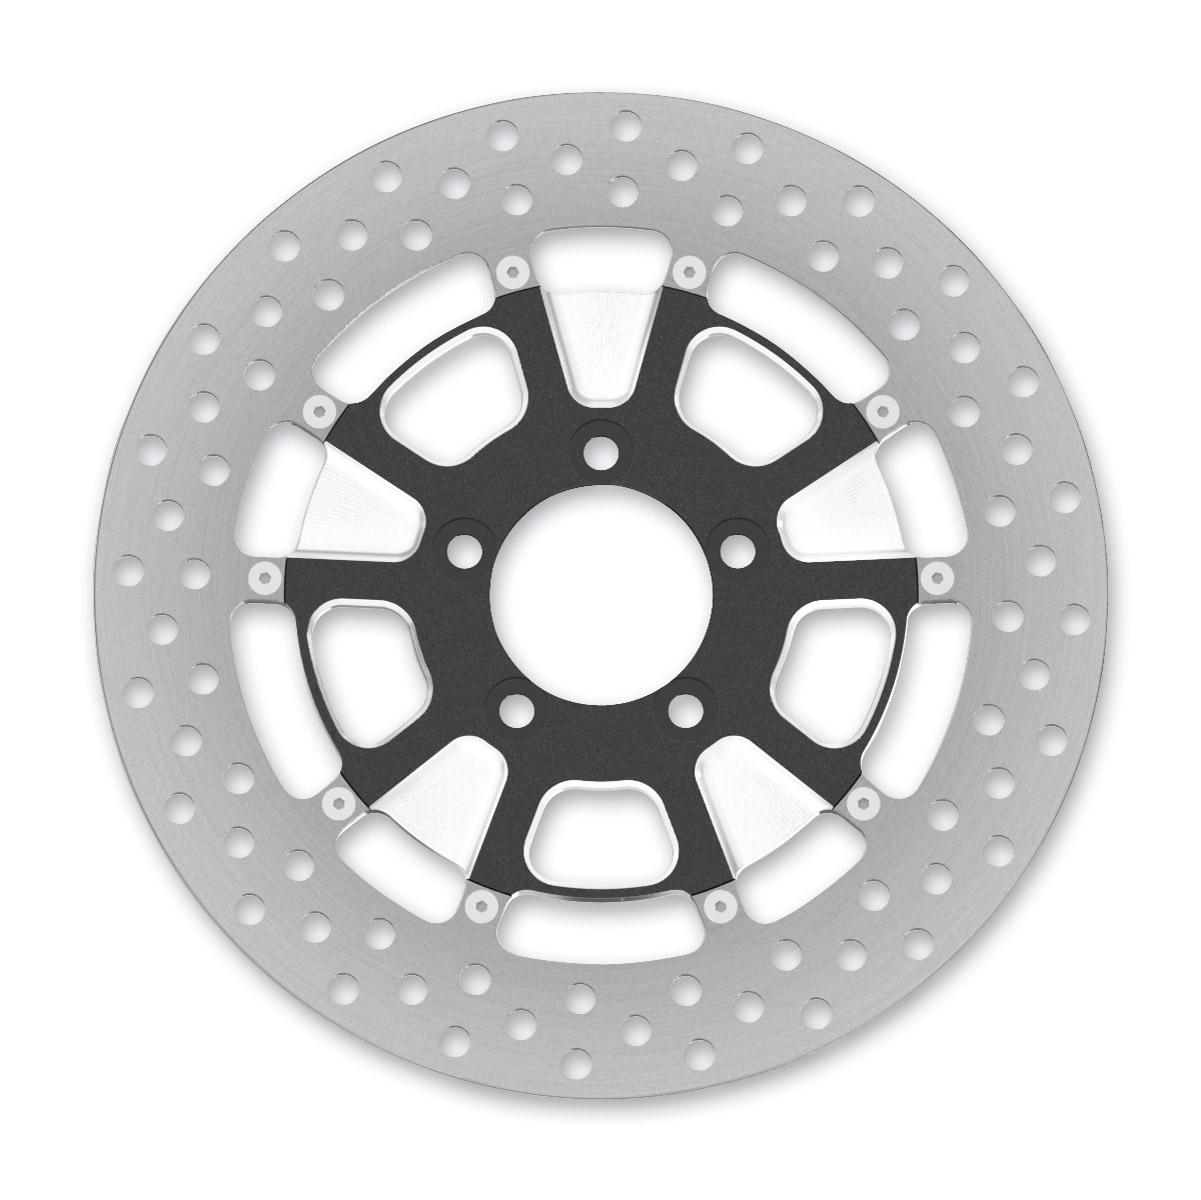 Roland Sands Design Raid Machine Ops Two-Piece Front Brake Rotor, 11.8